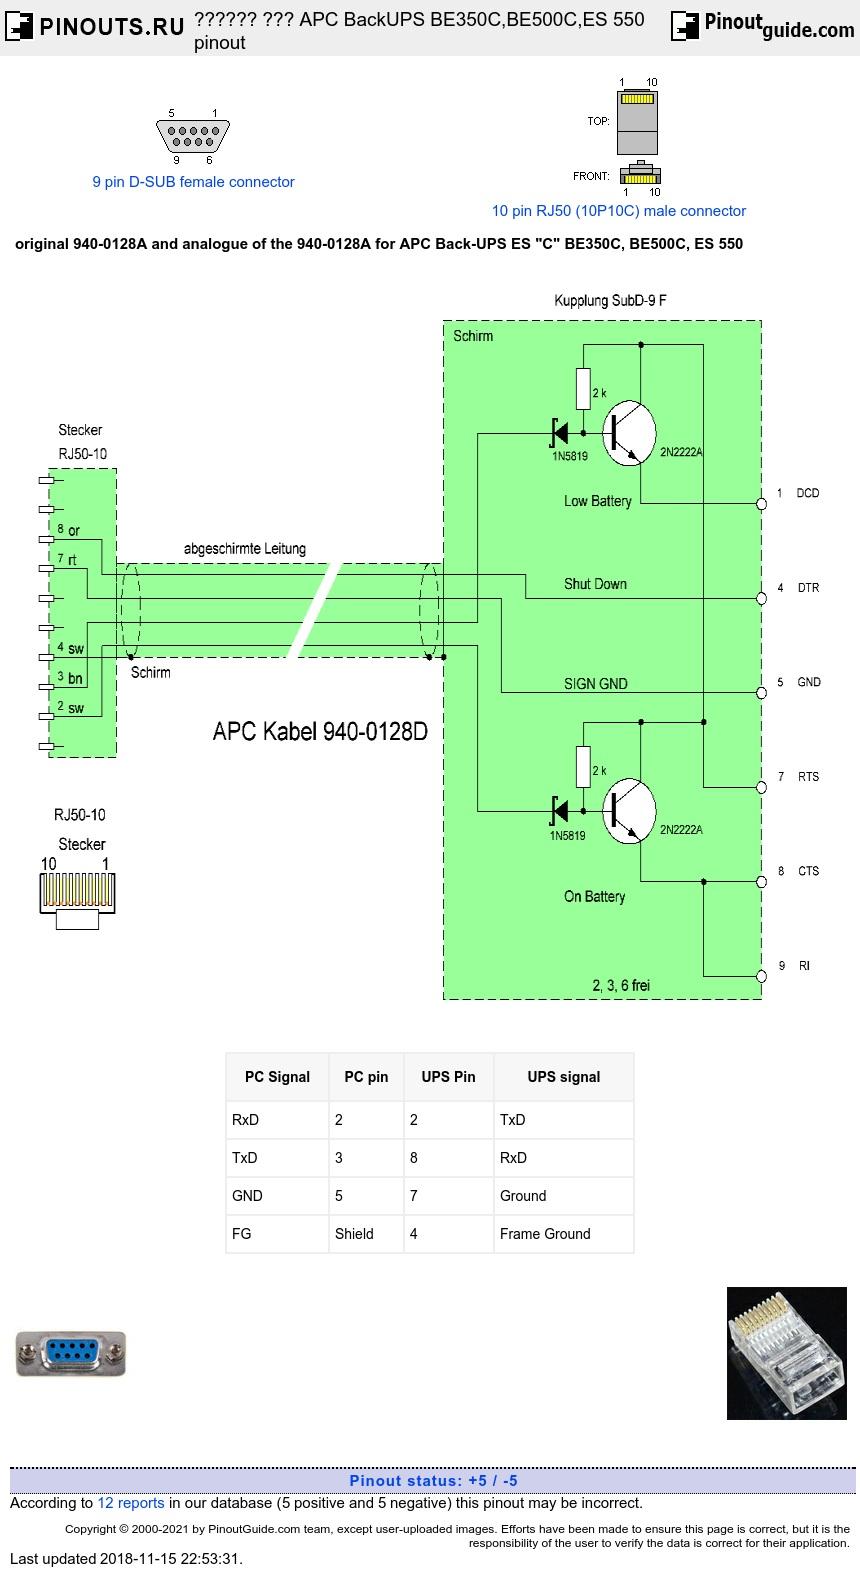 Ethernet Wiring Diagram Rj45 Apc Backups Be350c Be500c Es 550 Pinout Diagram